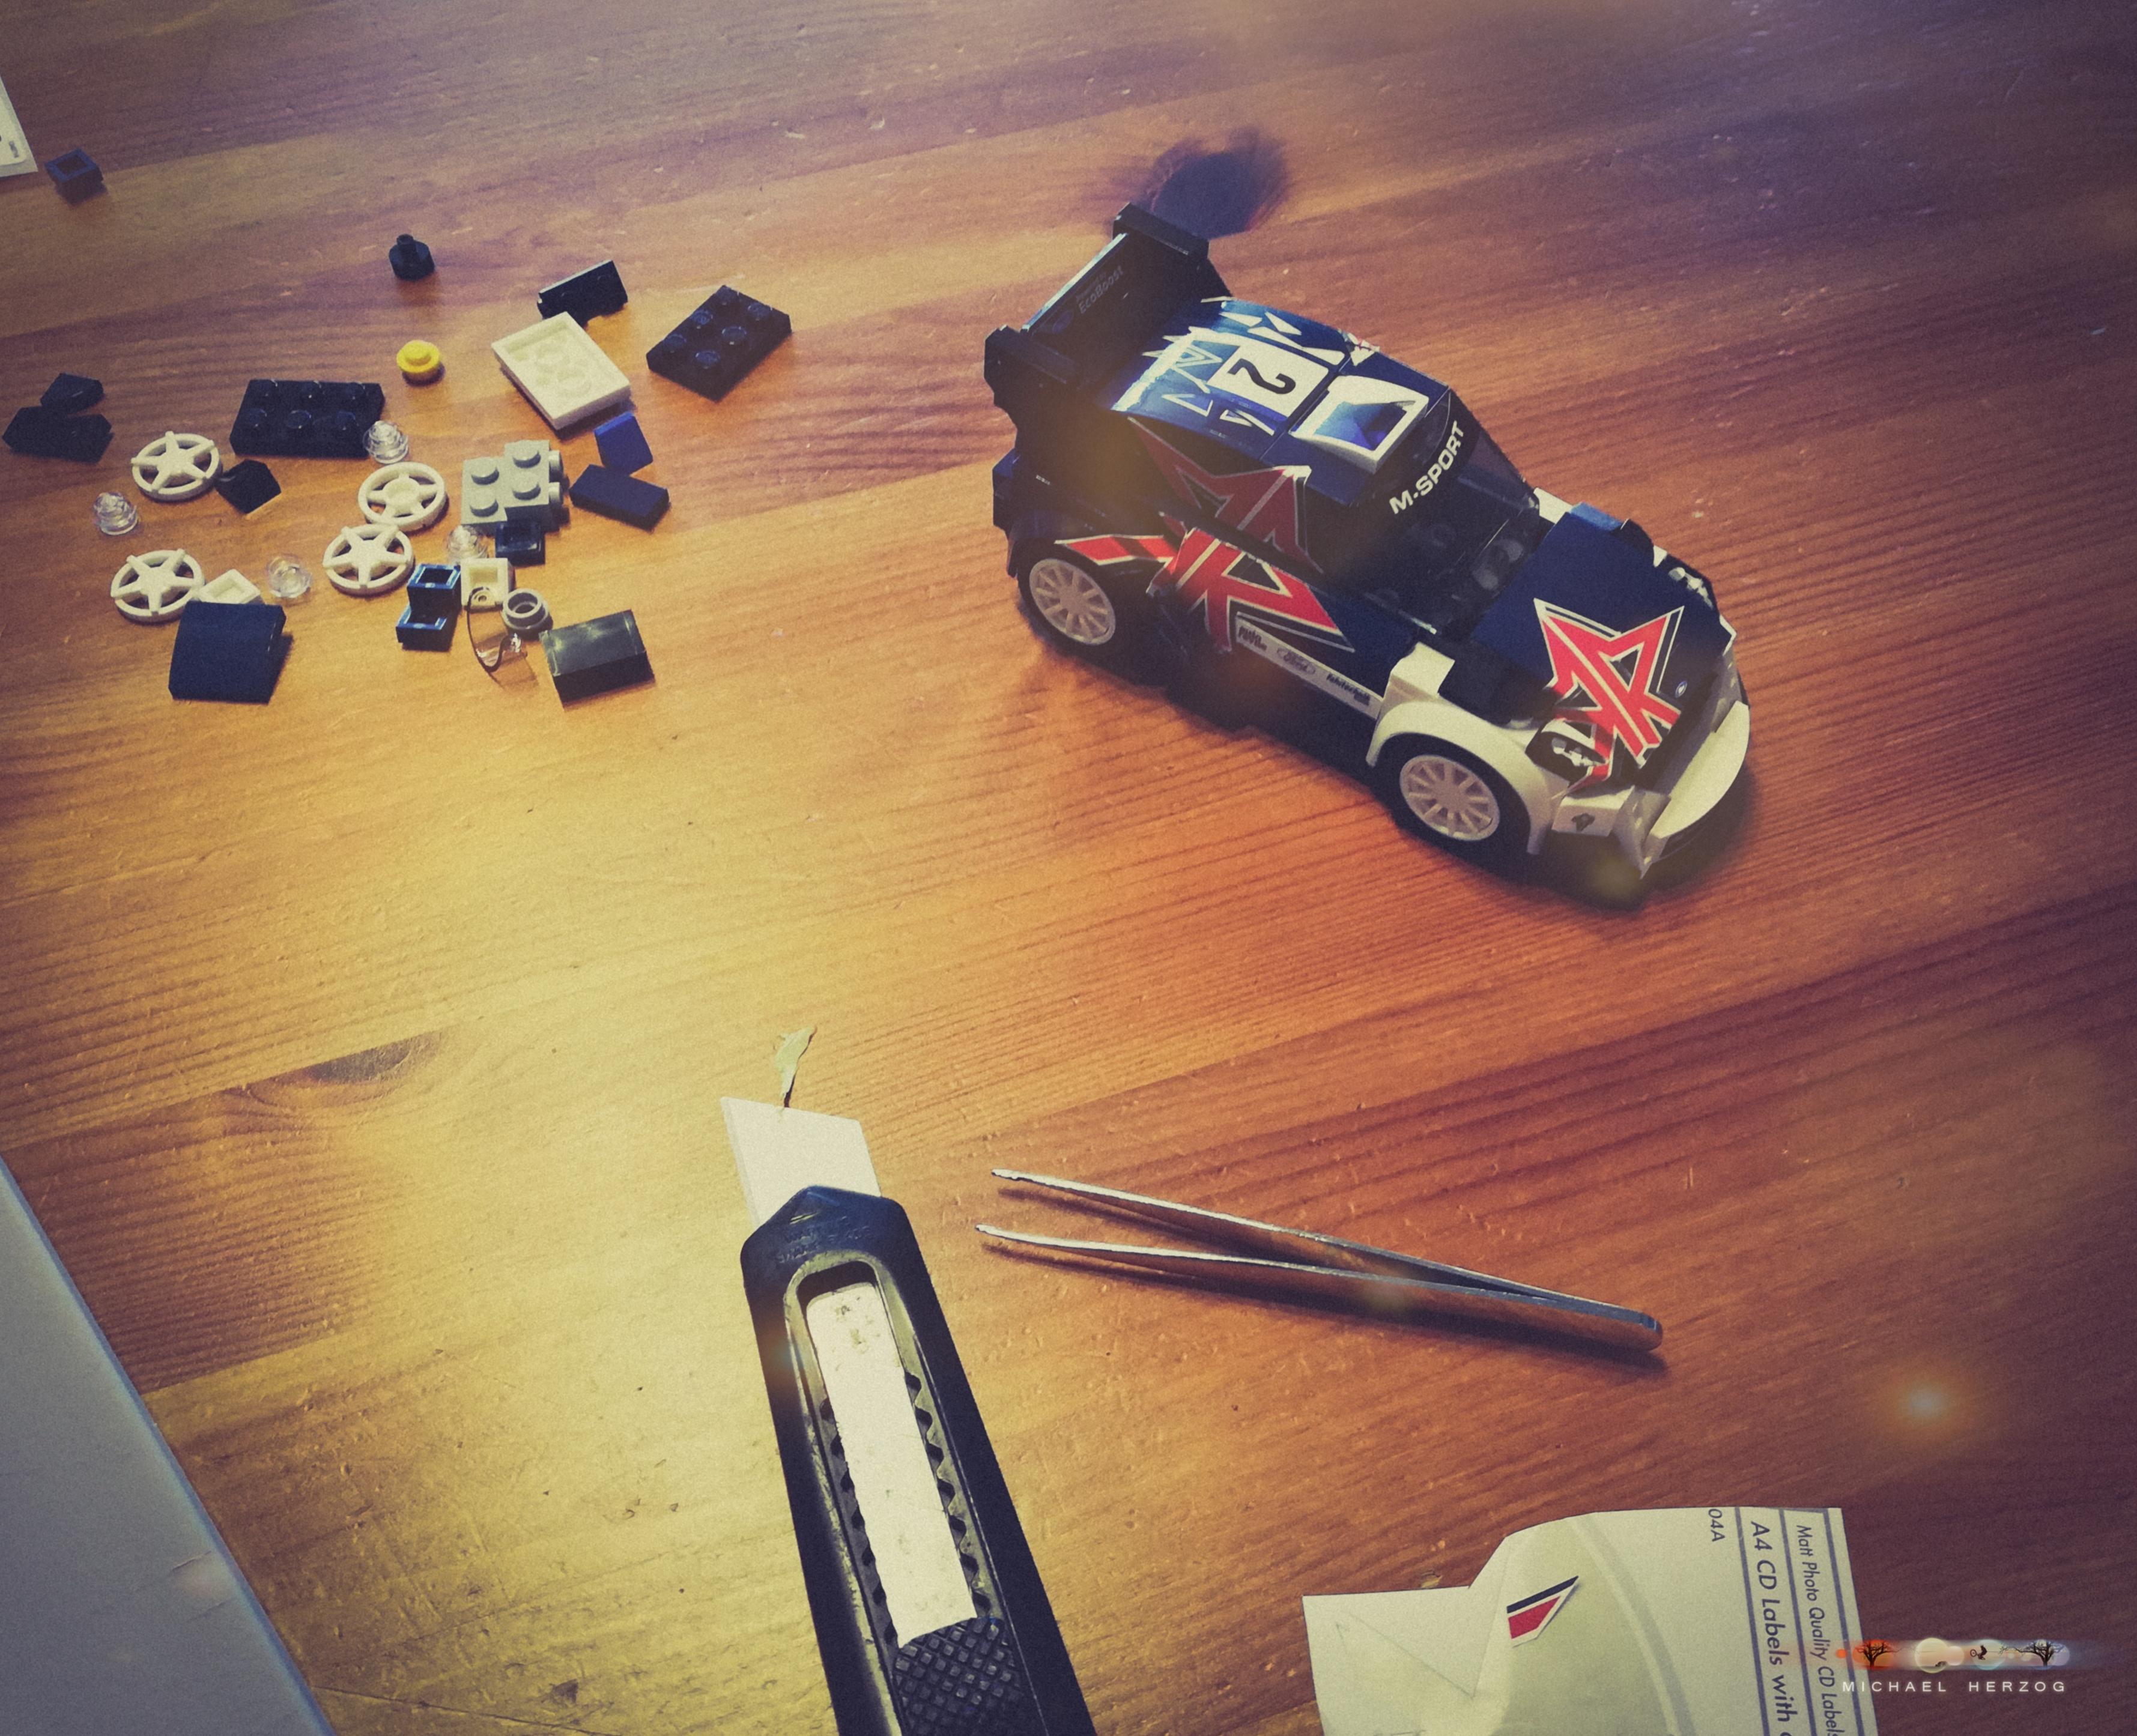 RacingRookie2019_Lego-Ford-Fiesta_Speedchampion_RookieEdition_AUTrenalinStudios-02.jpg